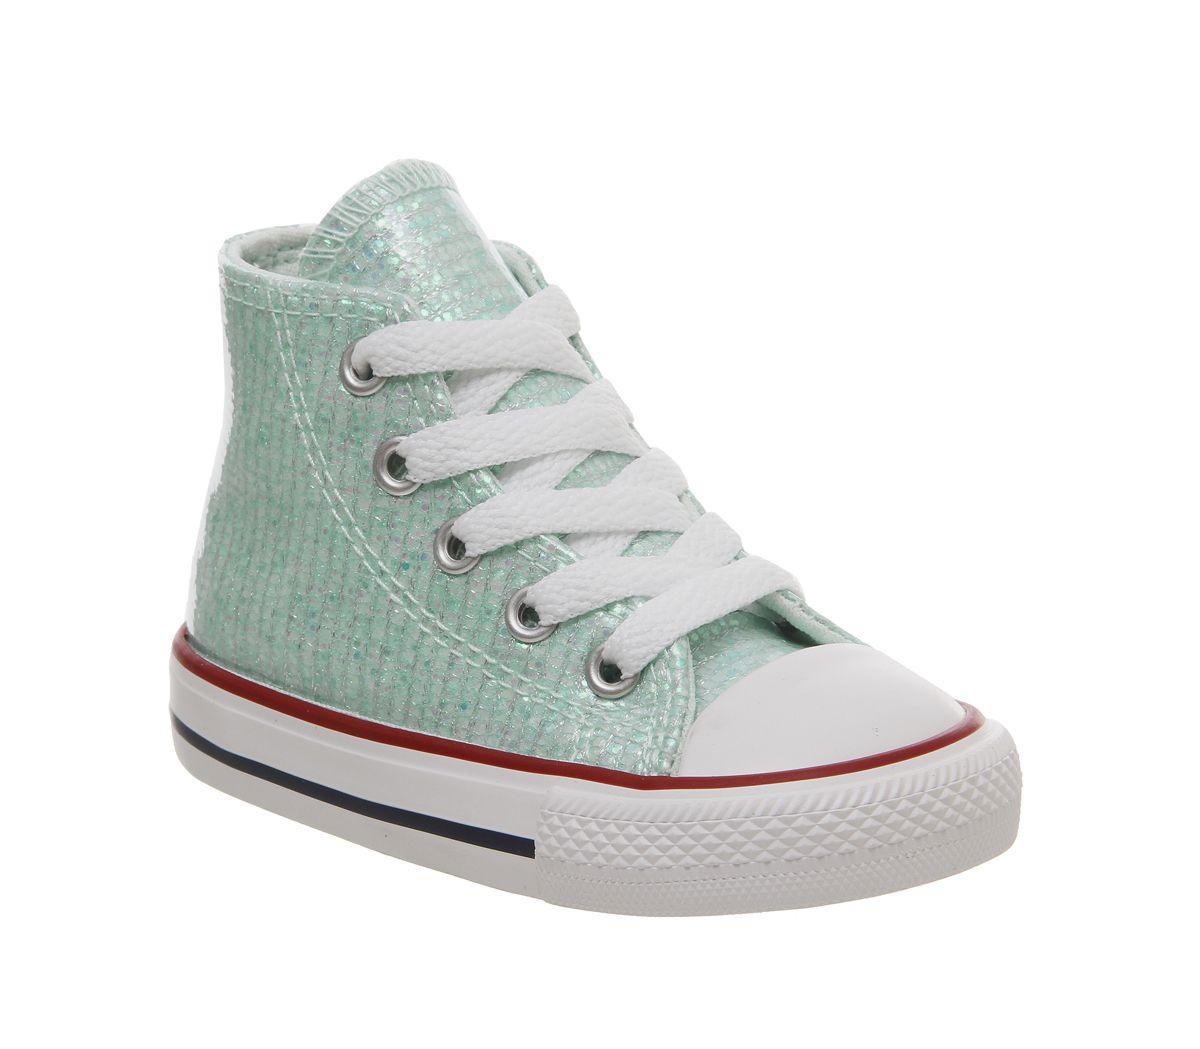 29c46271a0e5 Converse Small Star Hi Canvas Trainers Teal Tint Glitter White - Unisex